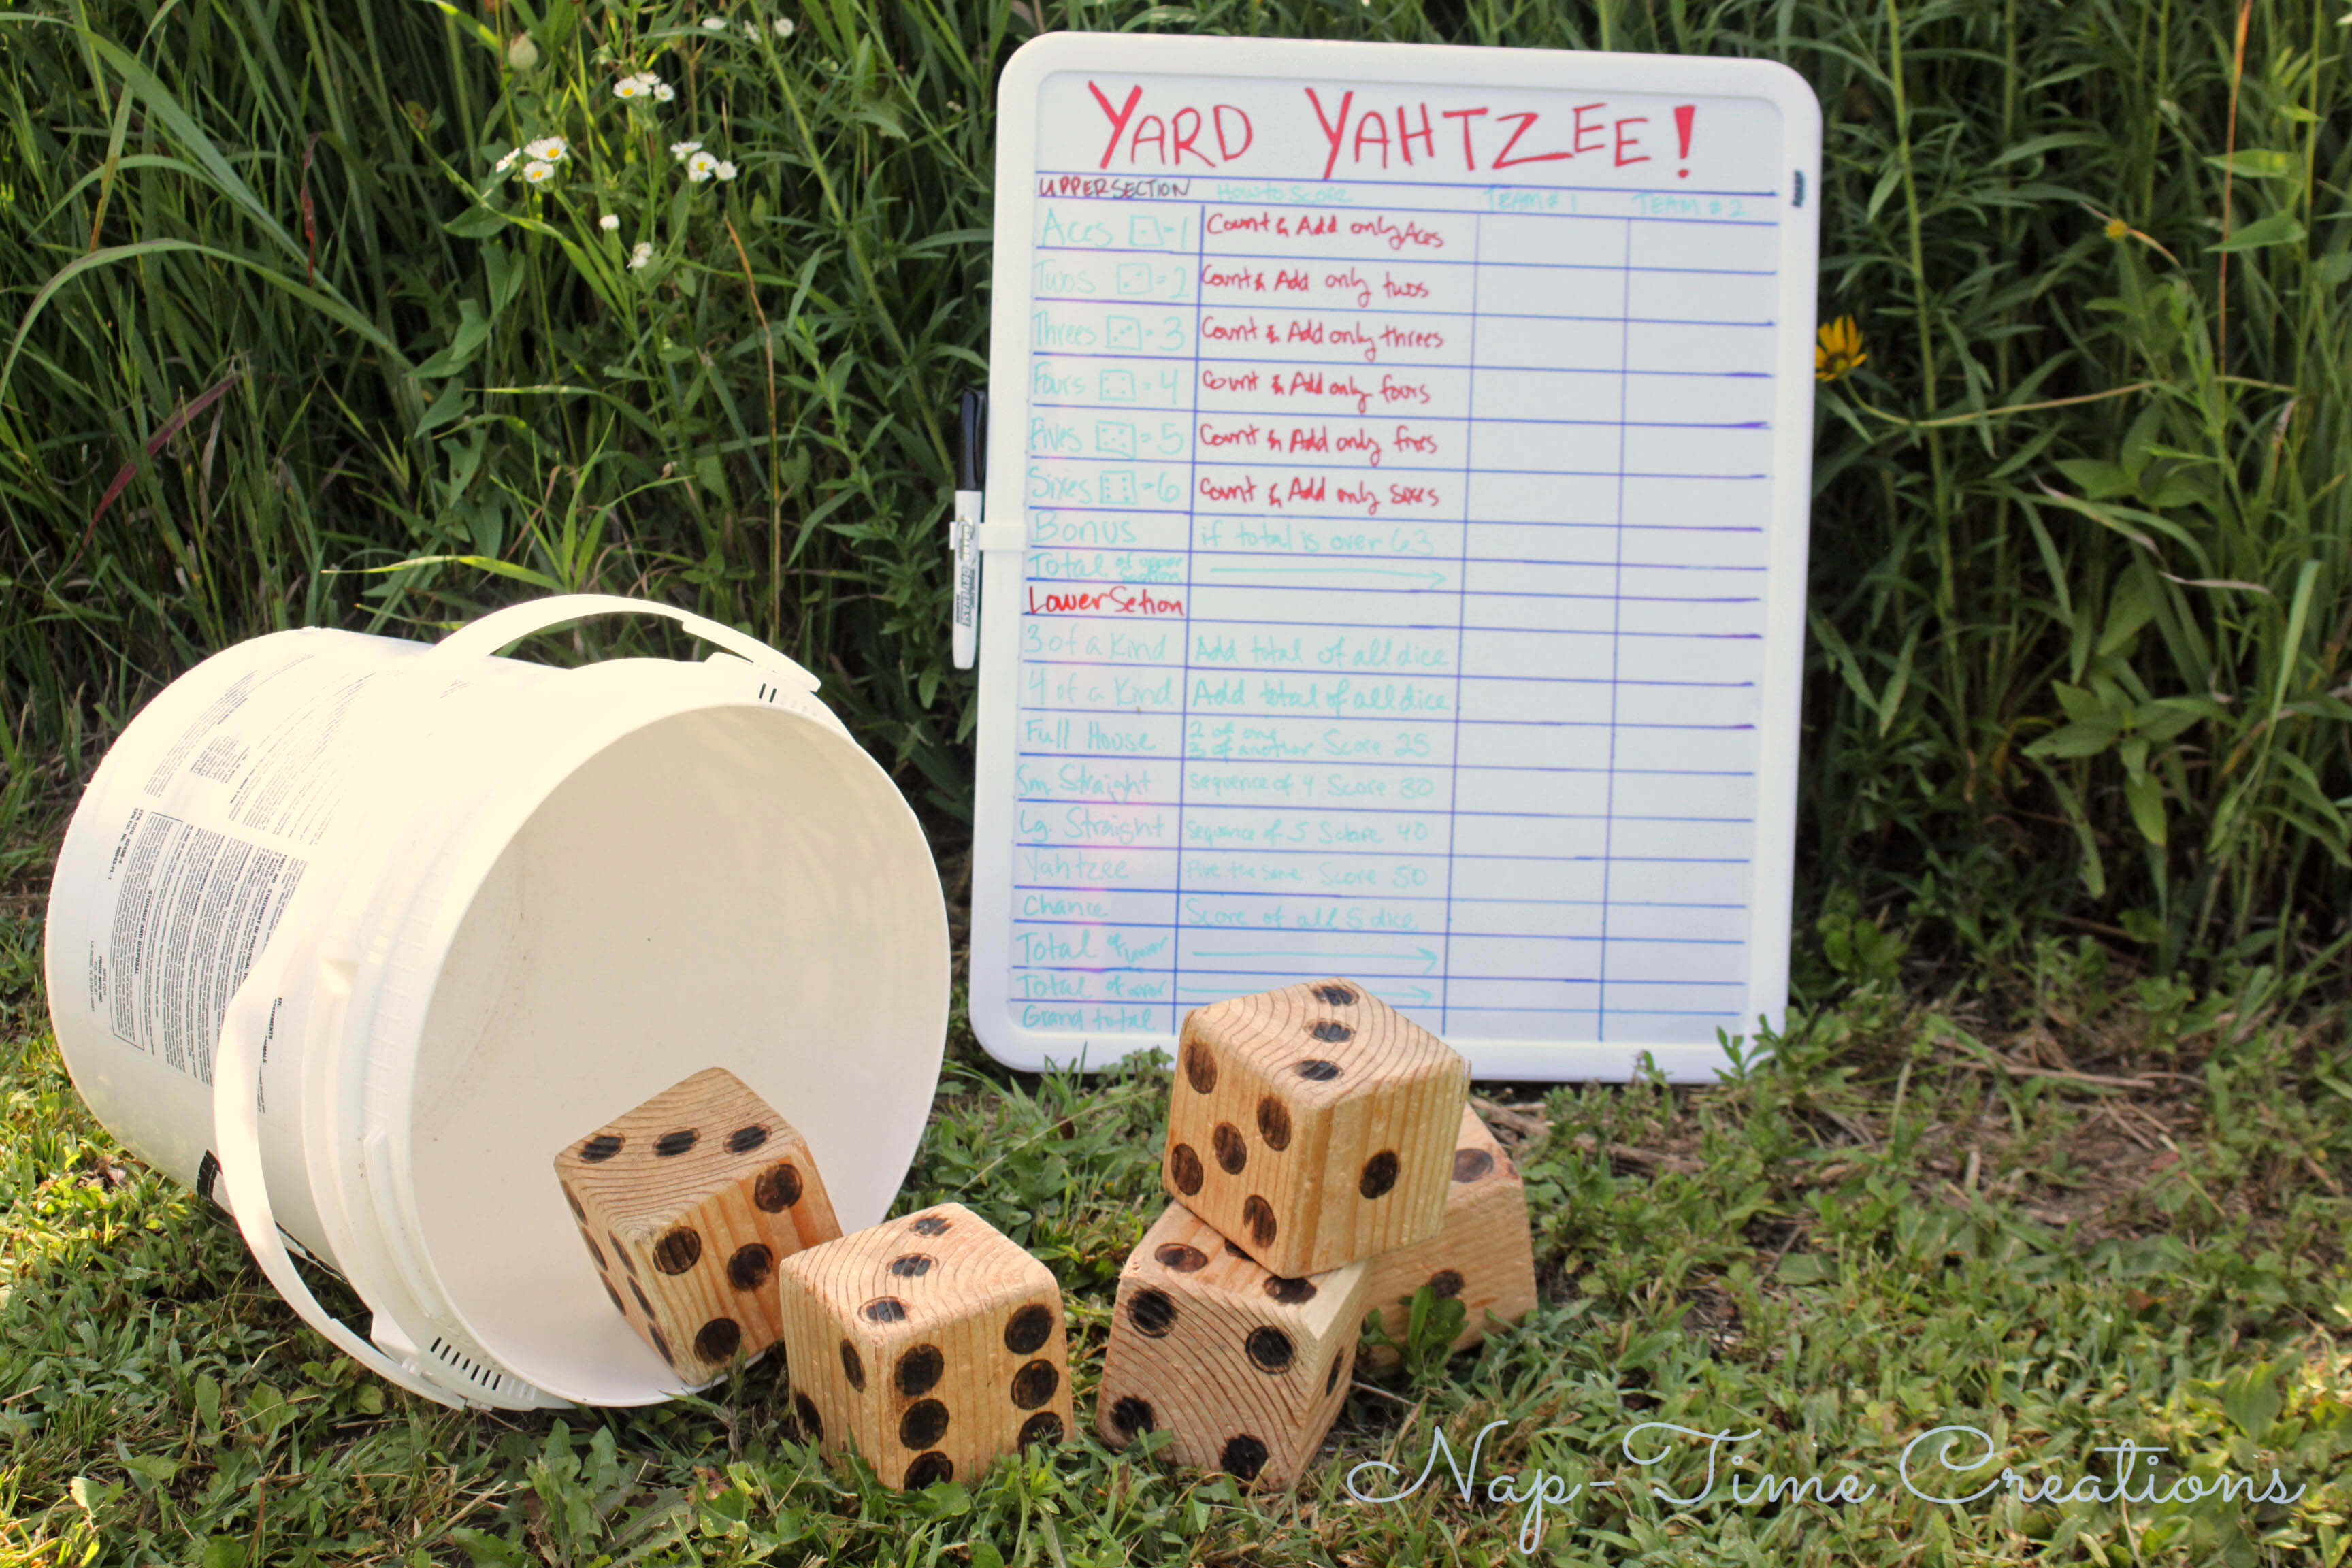 photo How to Play Yard Yahtzee